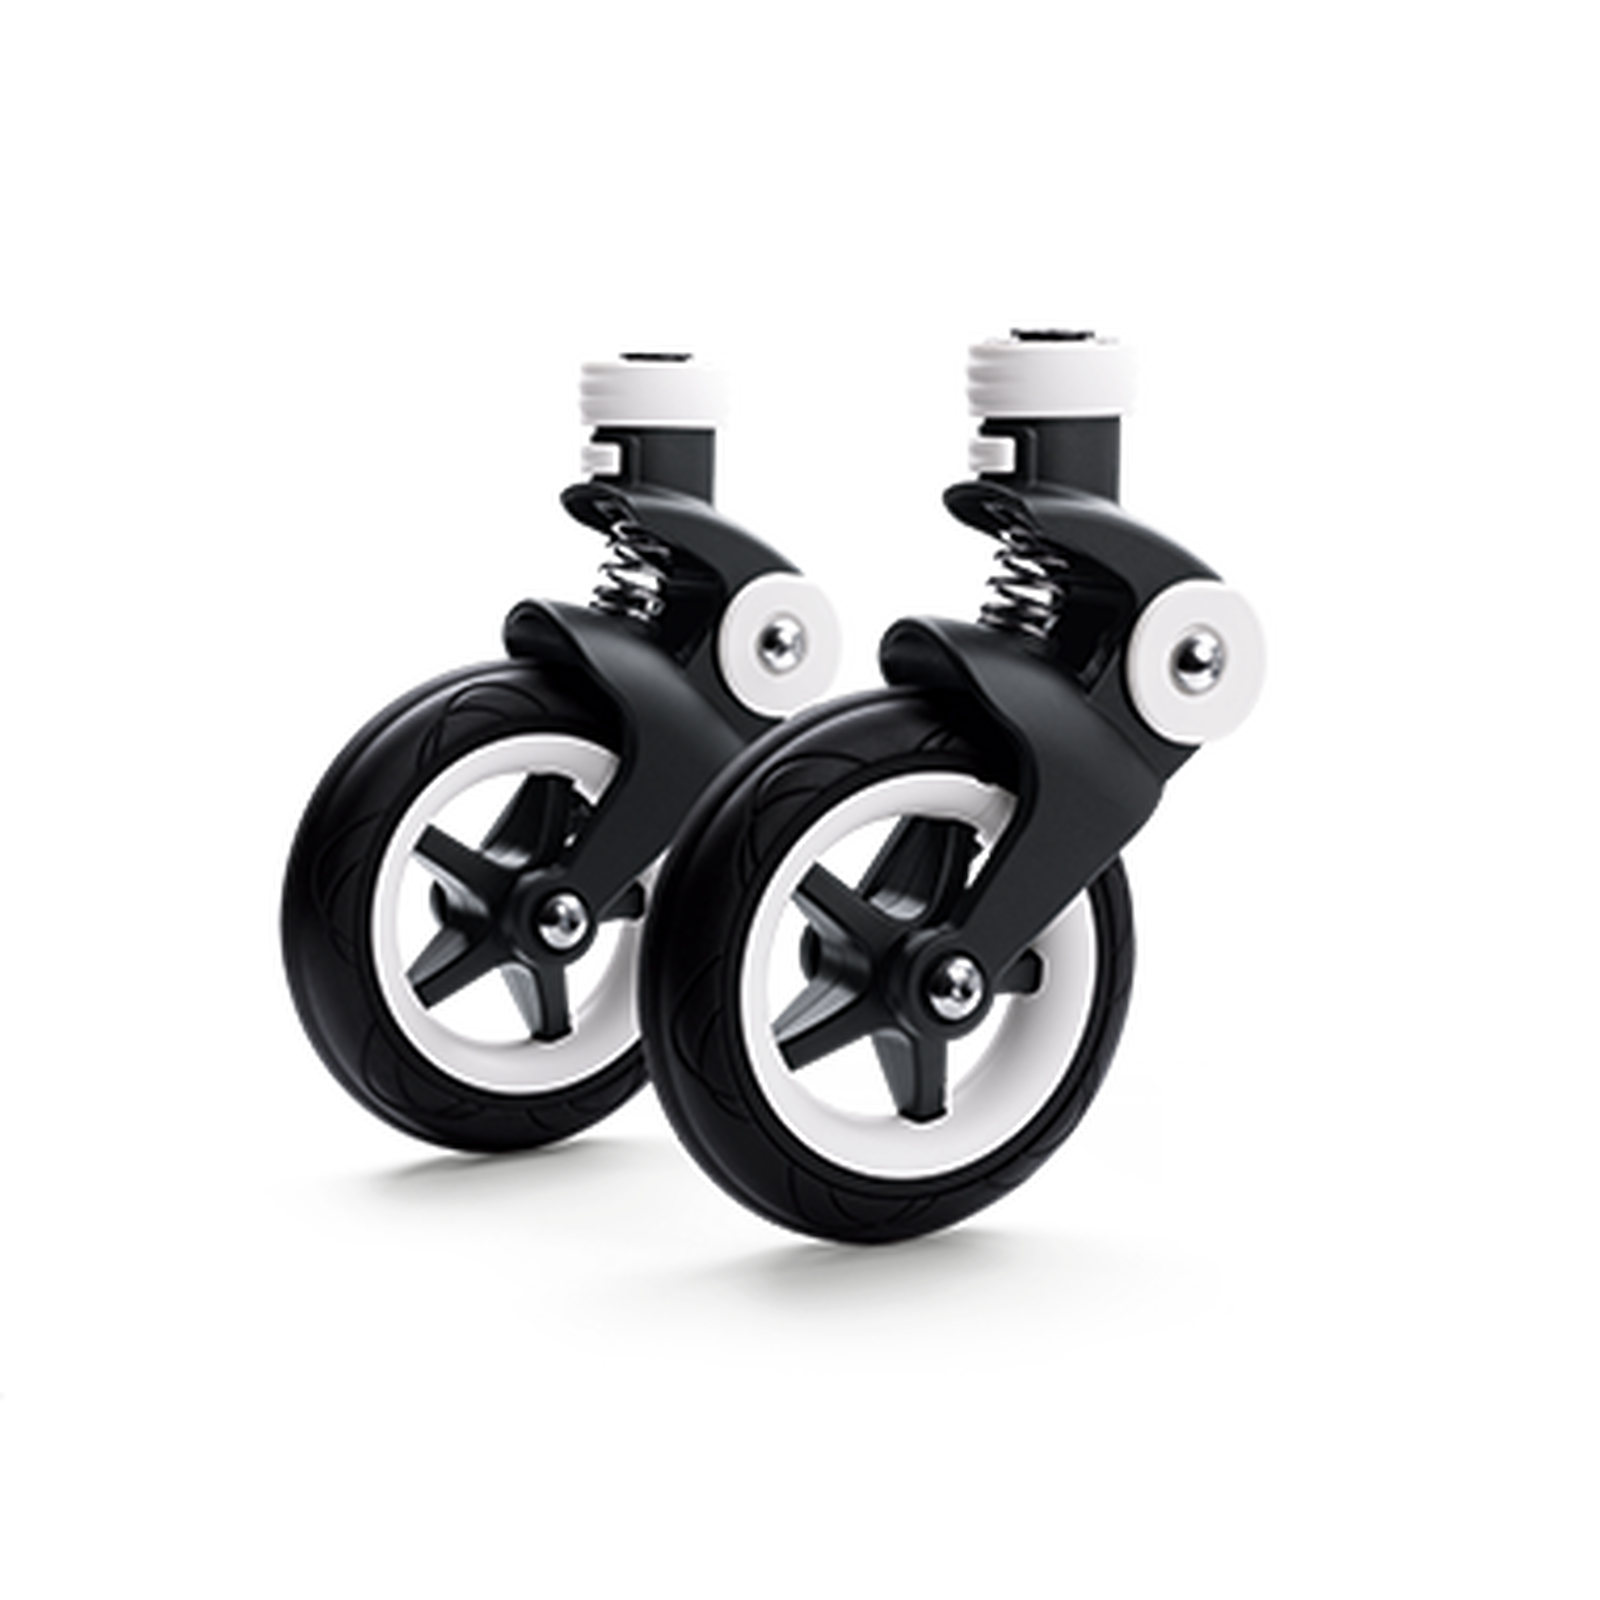 Bugaboo Bee 5 swivel wheels replacement set Black